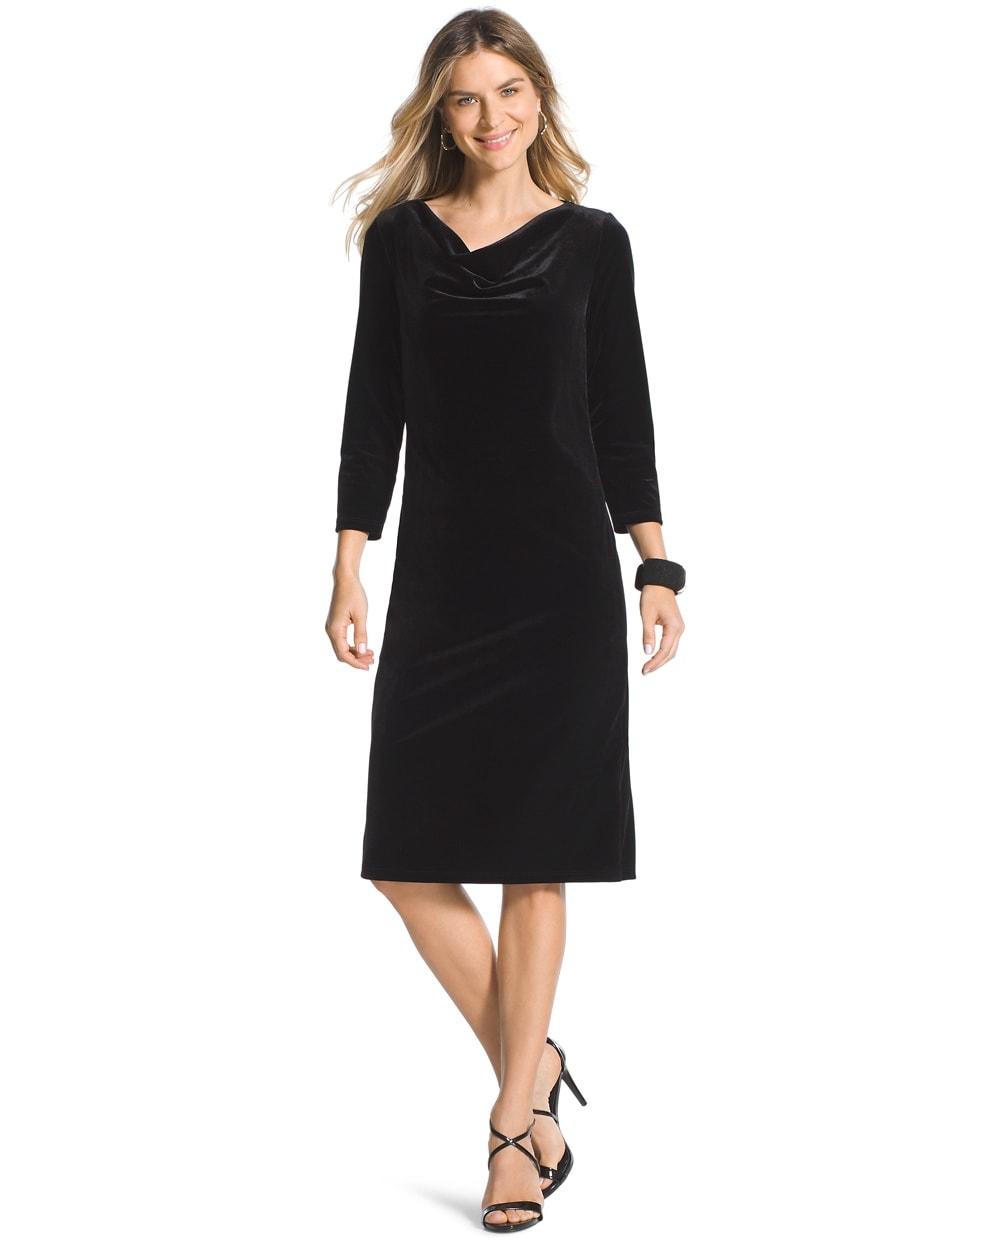 Travelers Collection Velvet Black Dress - Chicos